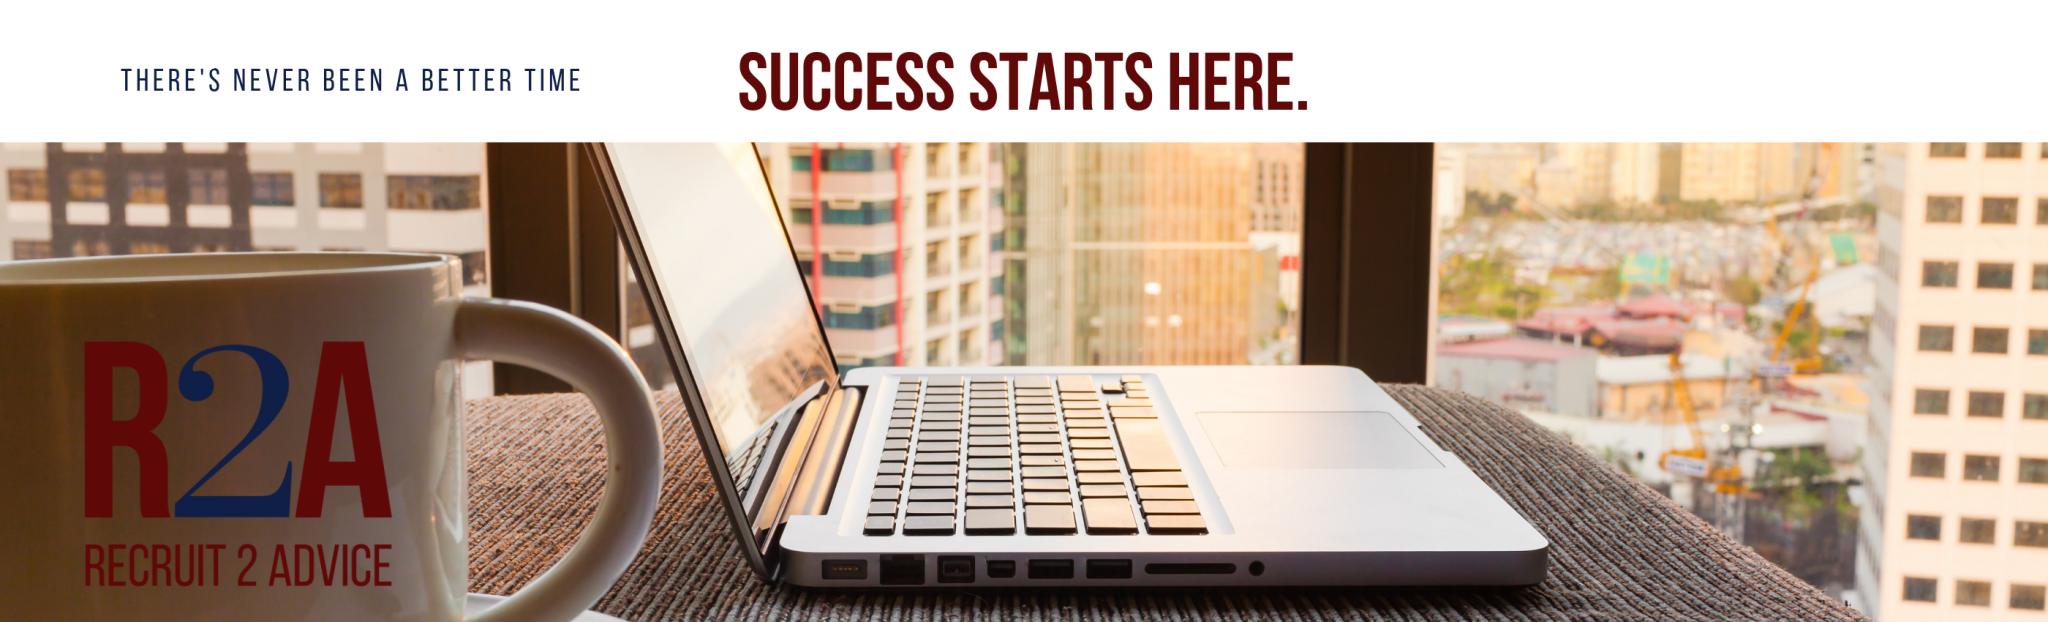 Recruit 2 Advice – Adversity brings Opportunity – Financial Planning Australia – Recruitment - Start Ups